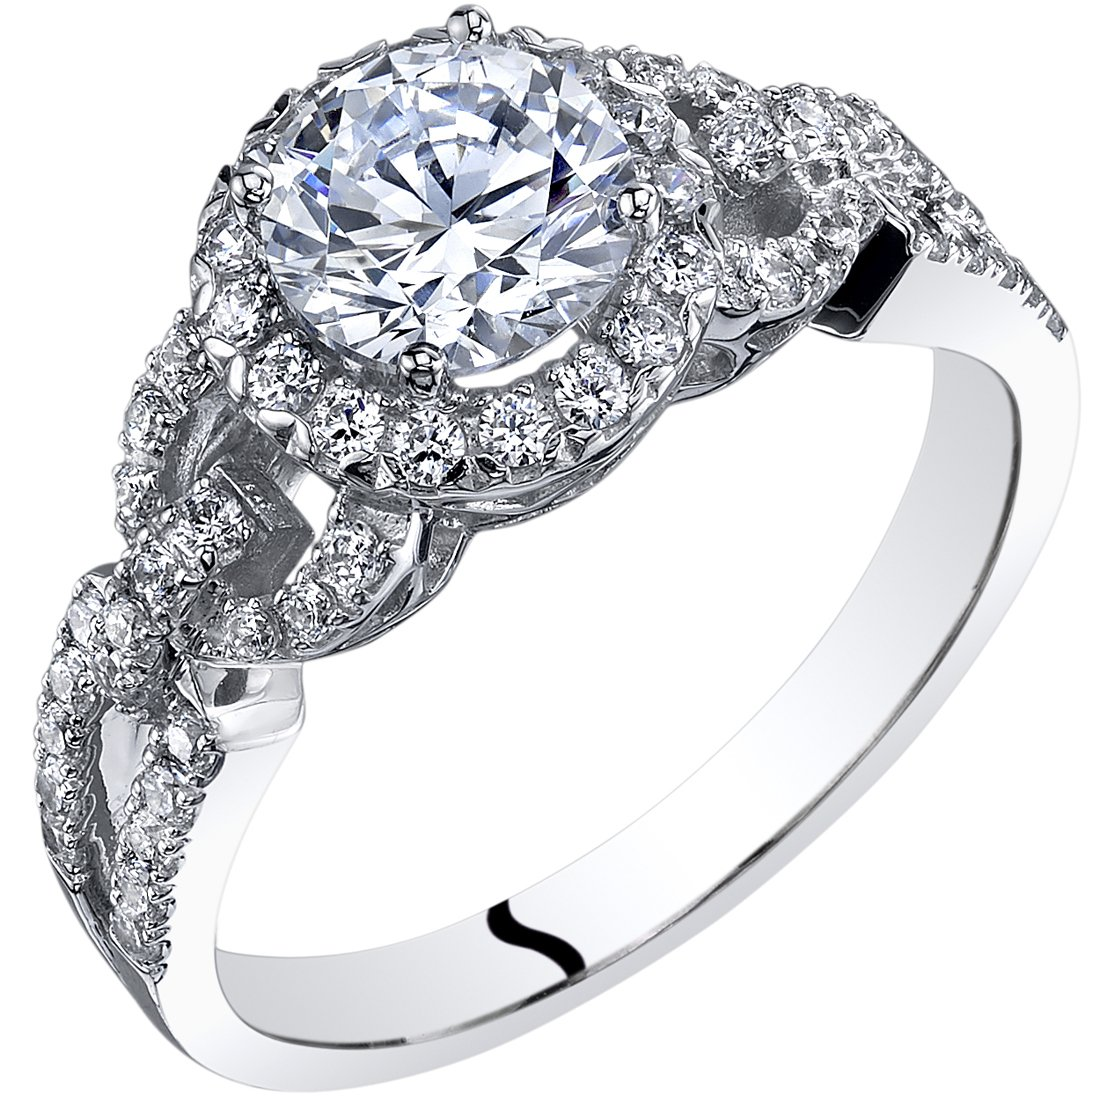 14k White Gold Cubic Zirconia Engagement Ring 1.00 Carat Center Size 8